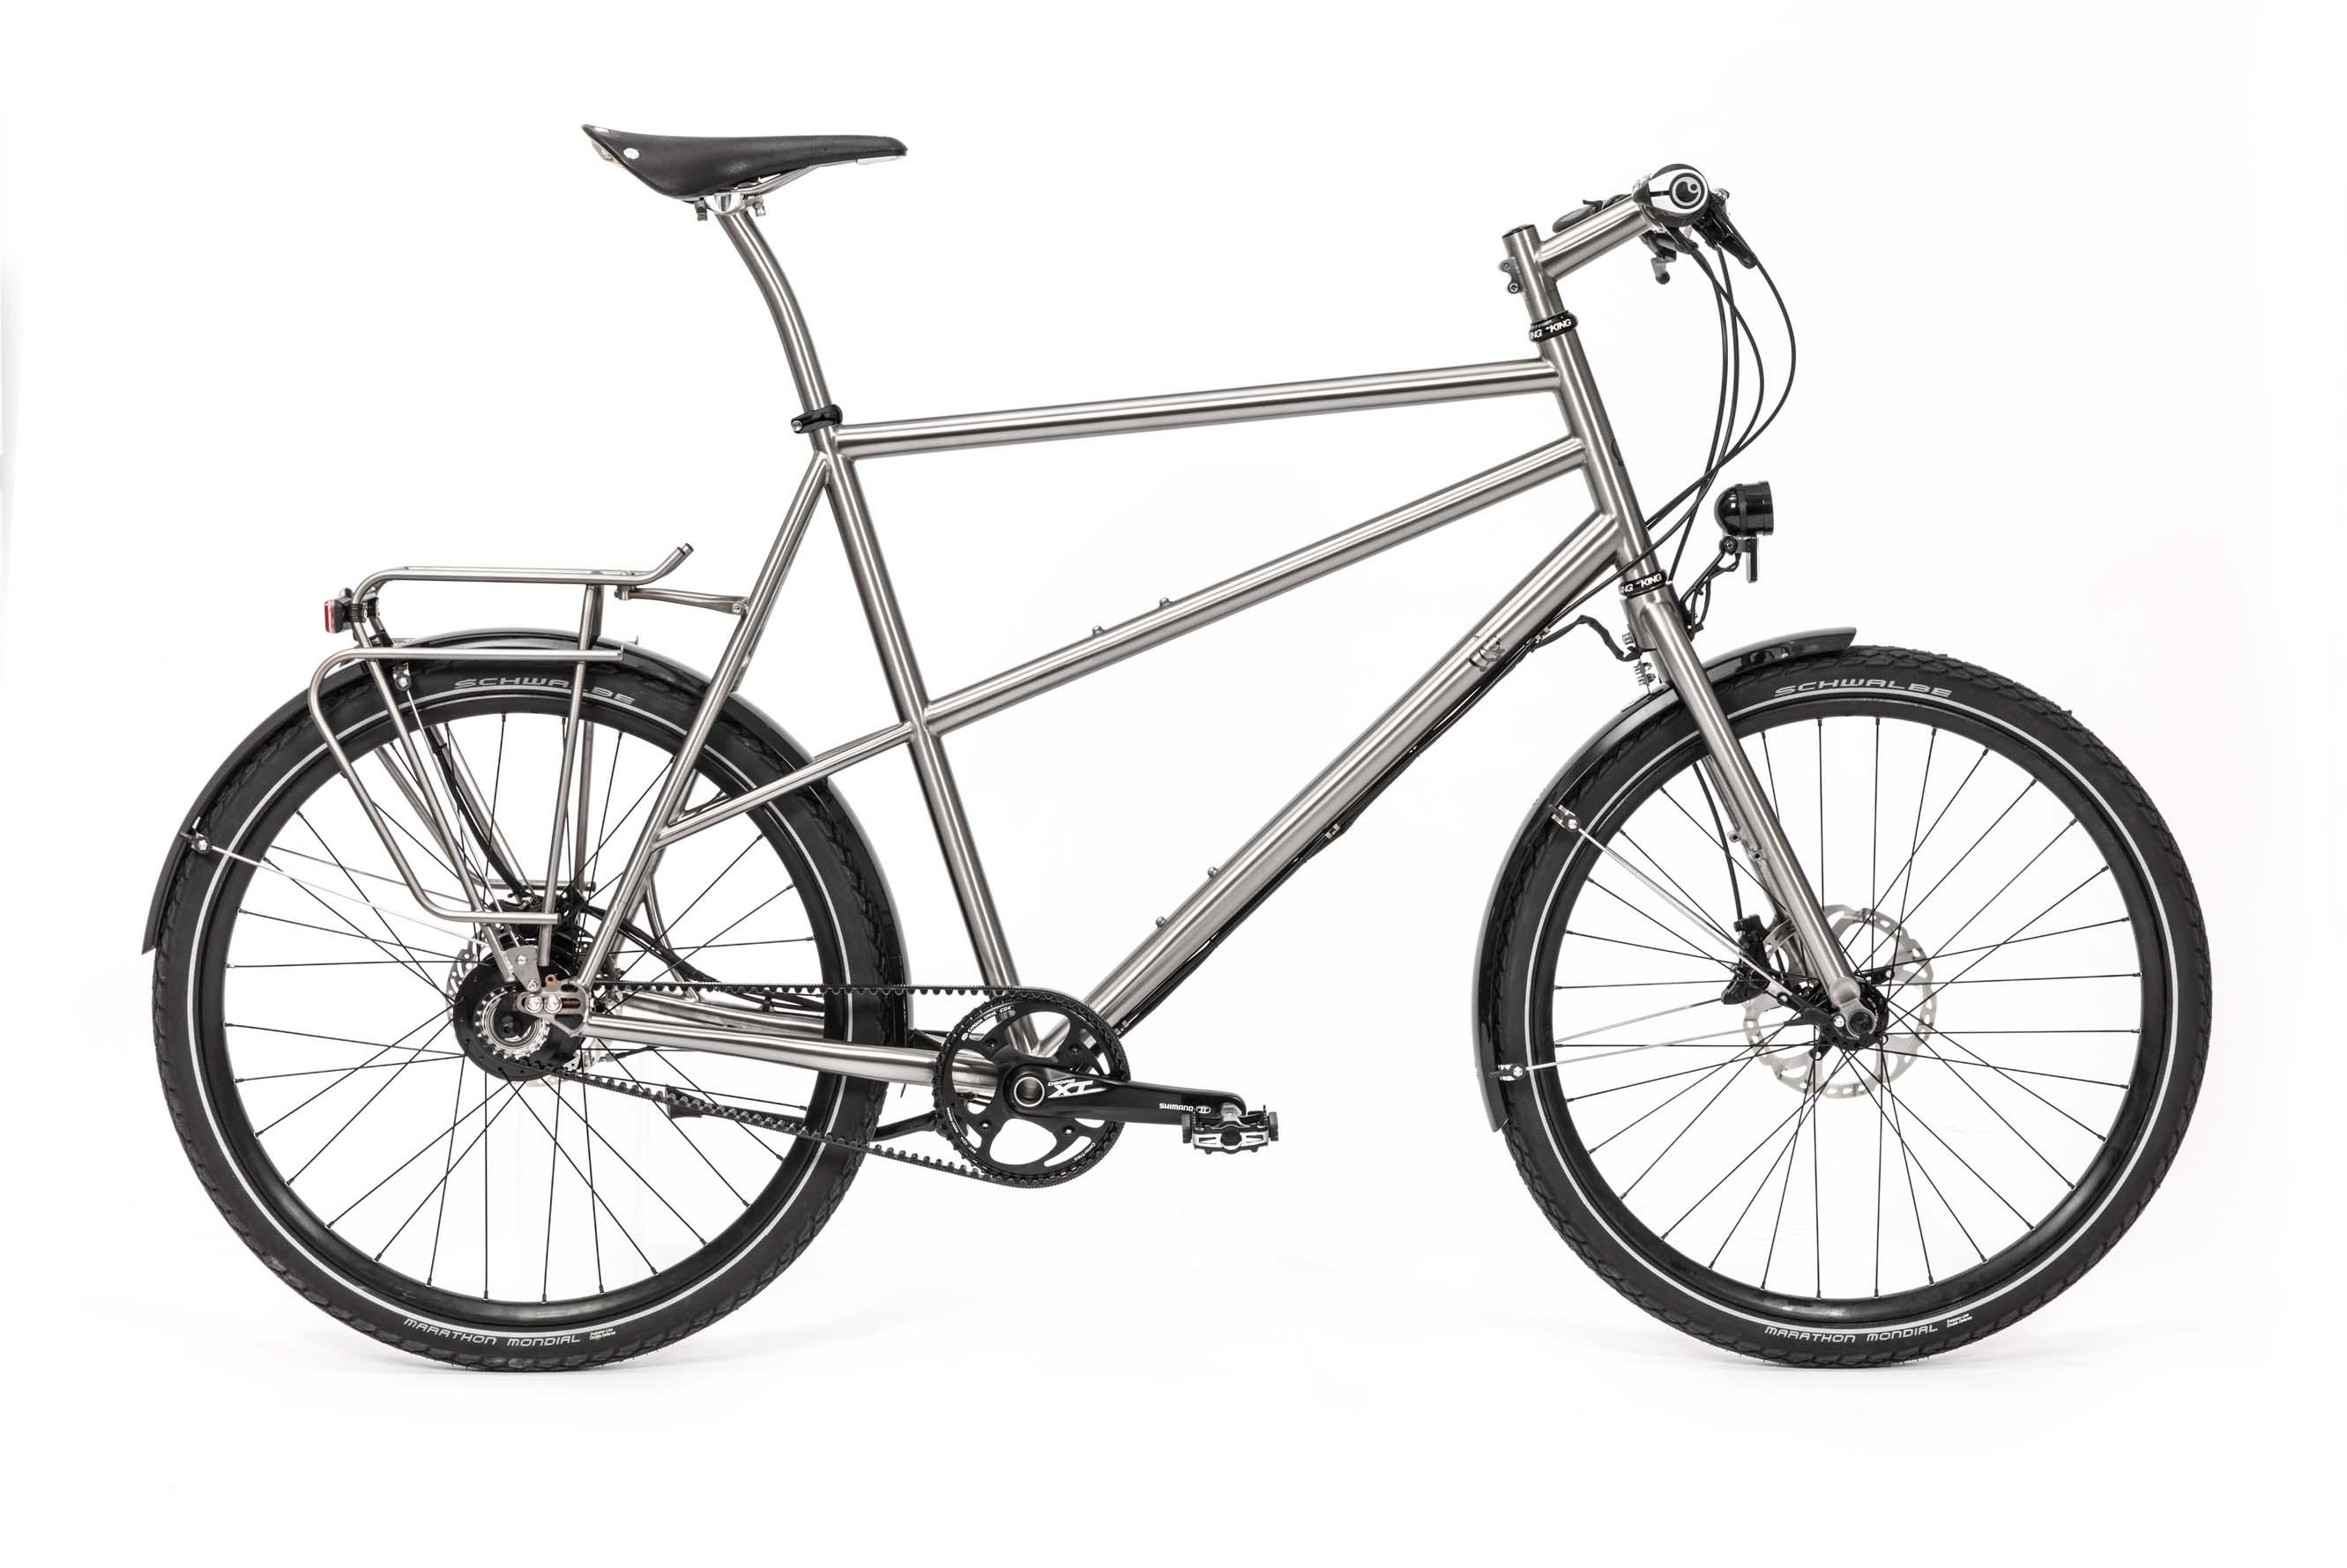 XXXL Titan Mass-Rahmen von HILITE-Bikes